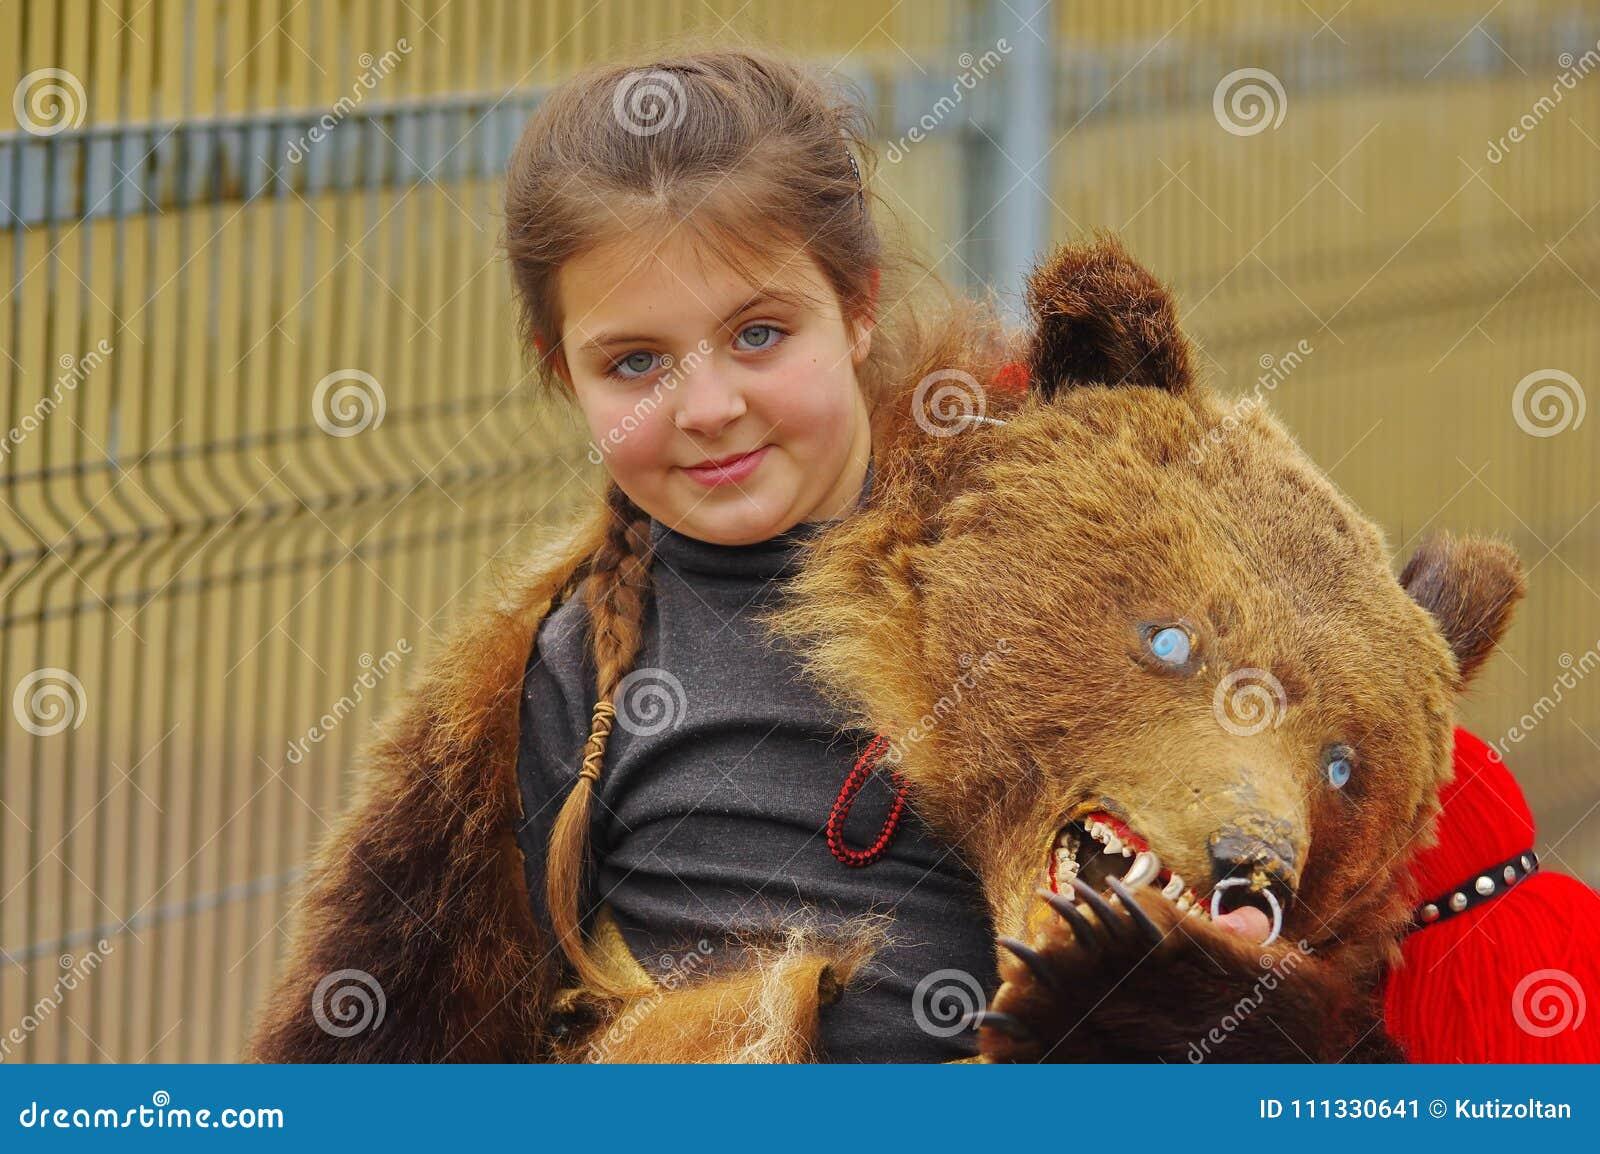 Have bear dance grls were